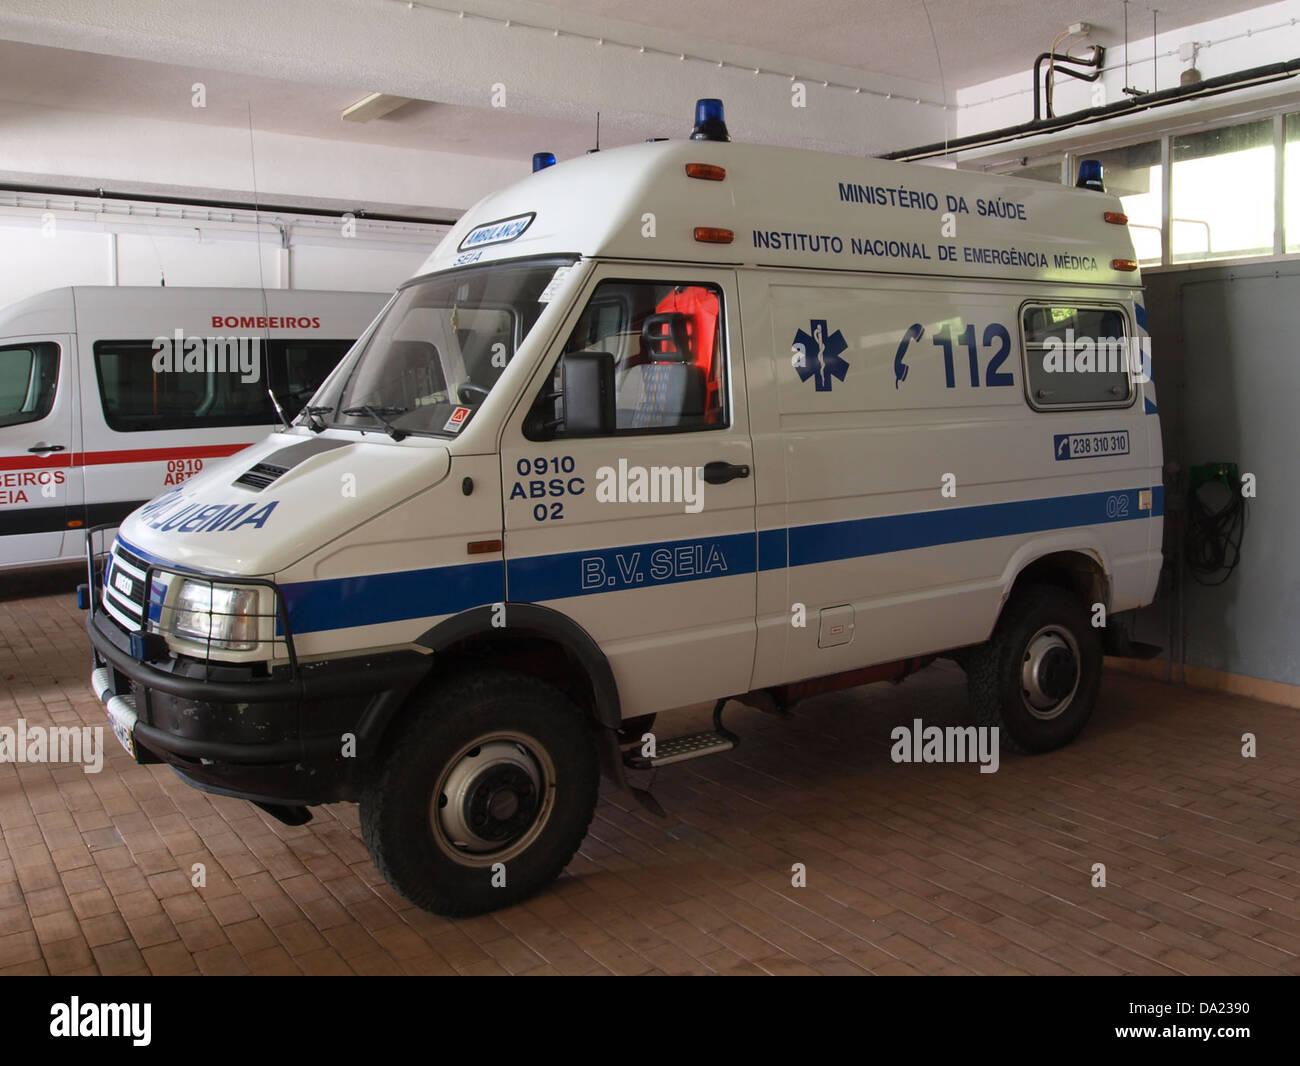 Iveco ambulance, Bombeiros Seia, Unit 0910 ABSC 02 - Stock Image